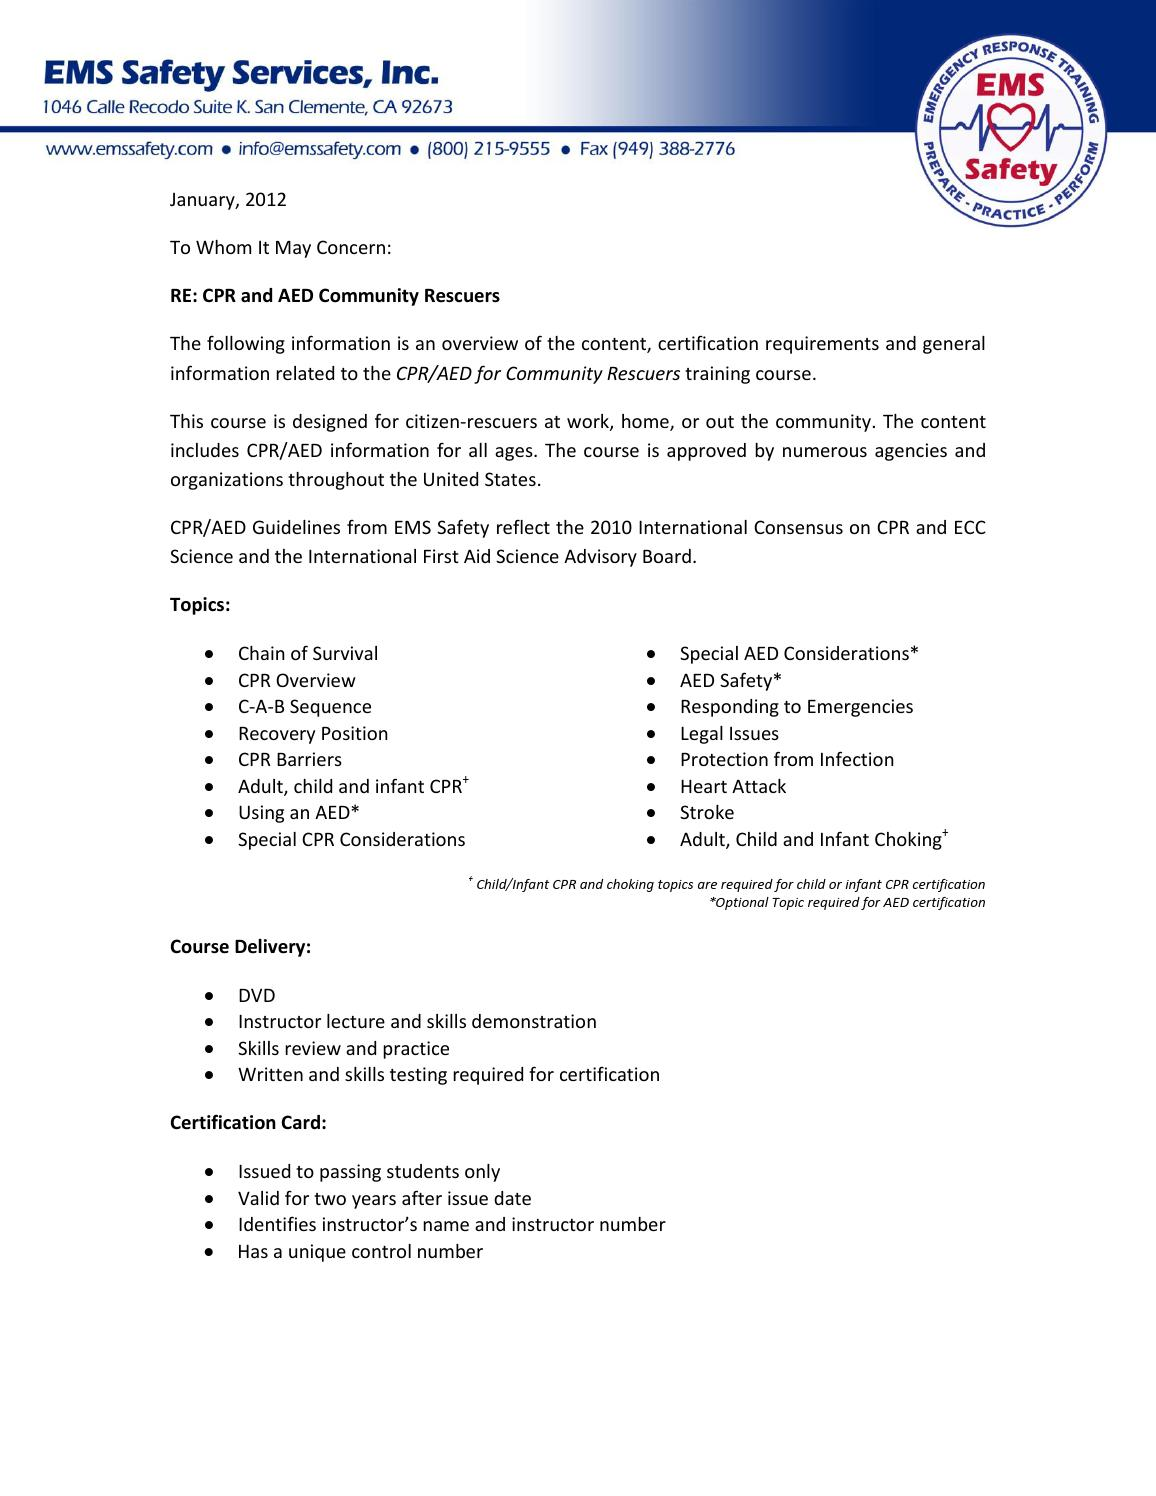 Program Overviewcommunity Cpr Aedg201003 12 By Basmulder Issuu